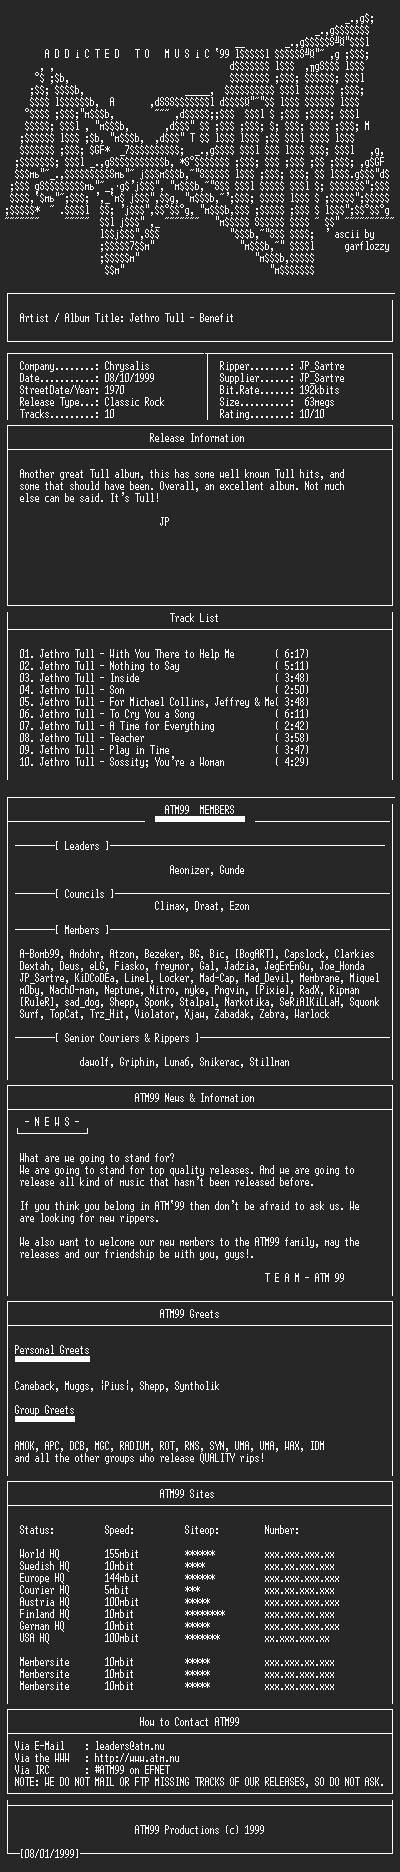 NFO file for Jethro_Tull_-_Benefit_-_(1970)-ATM99